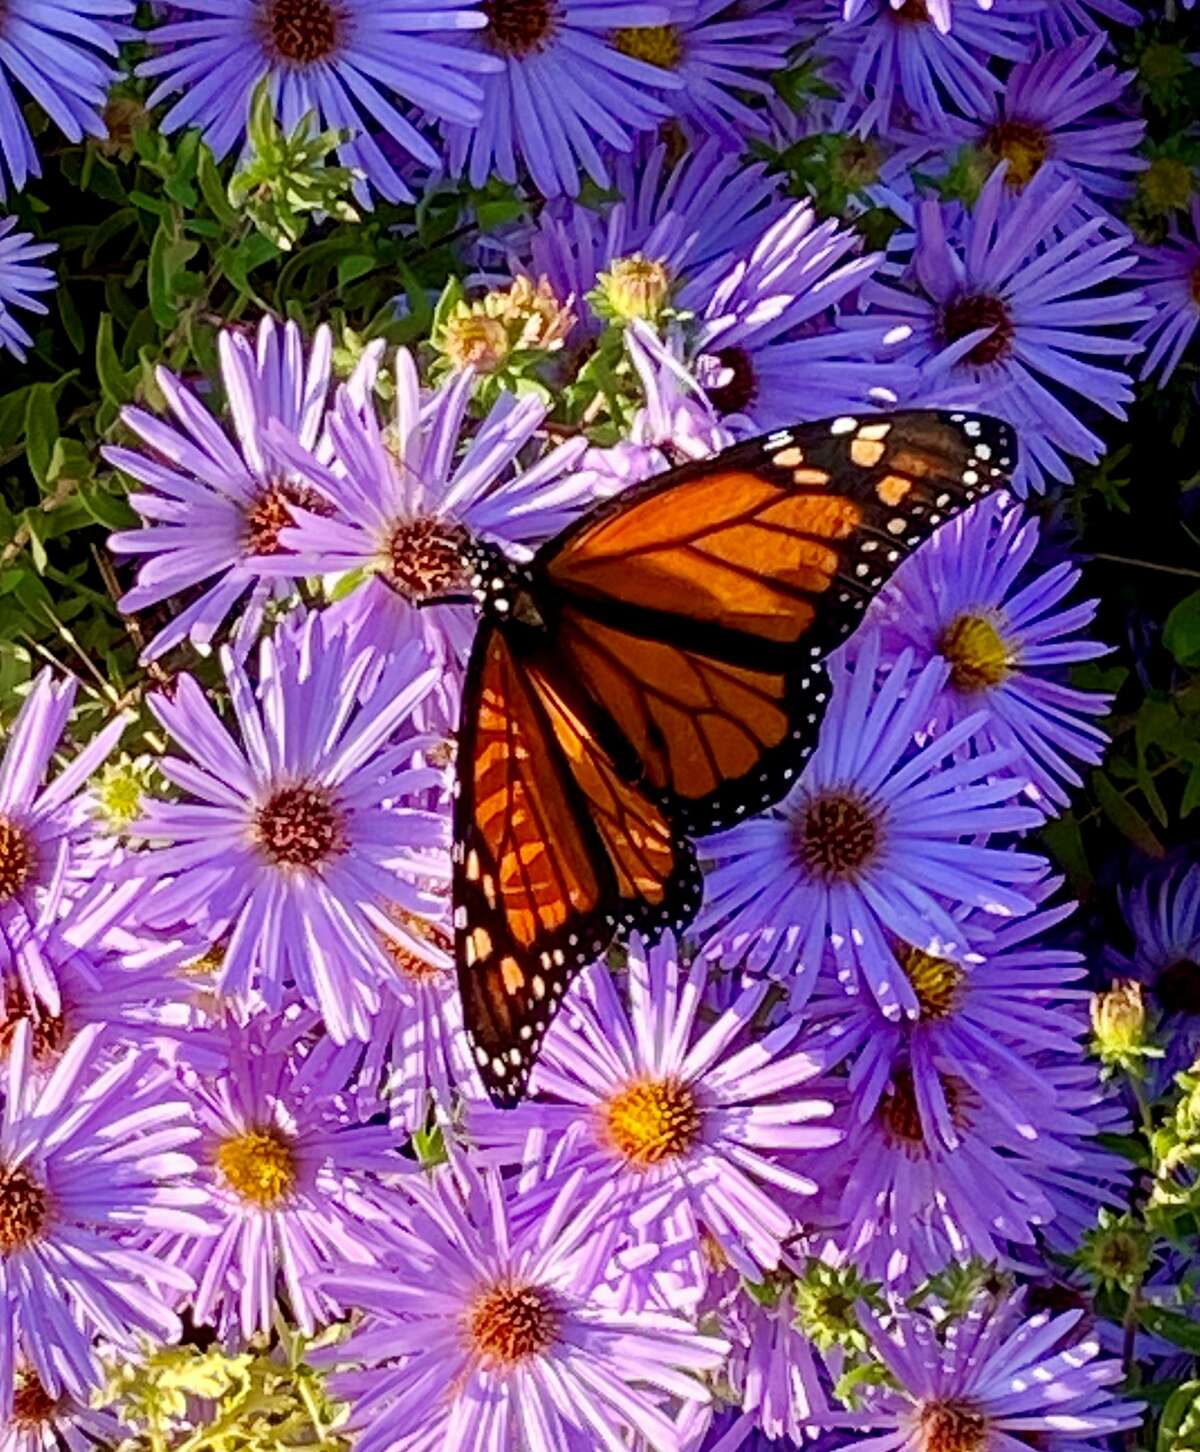 A Monarch butterfly feeds in a friend's Albany garden, by Richard Vitkay